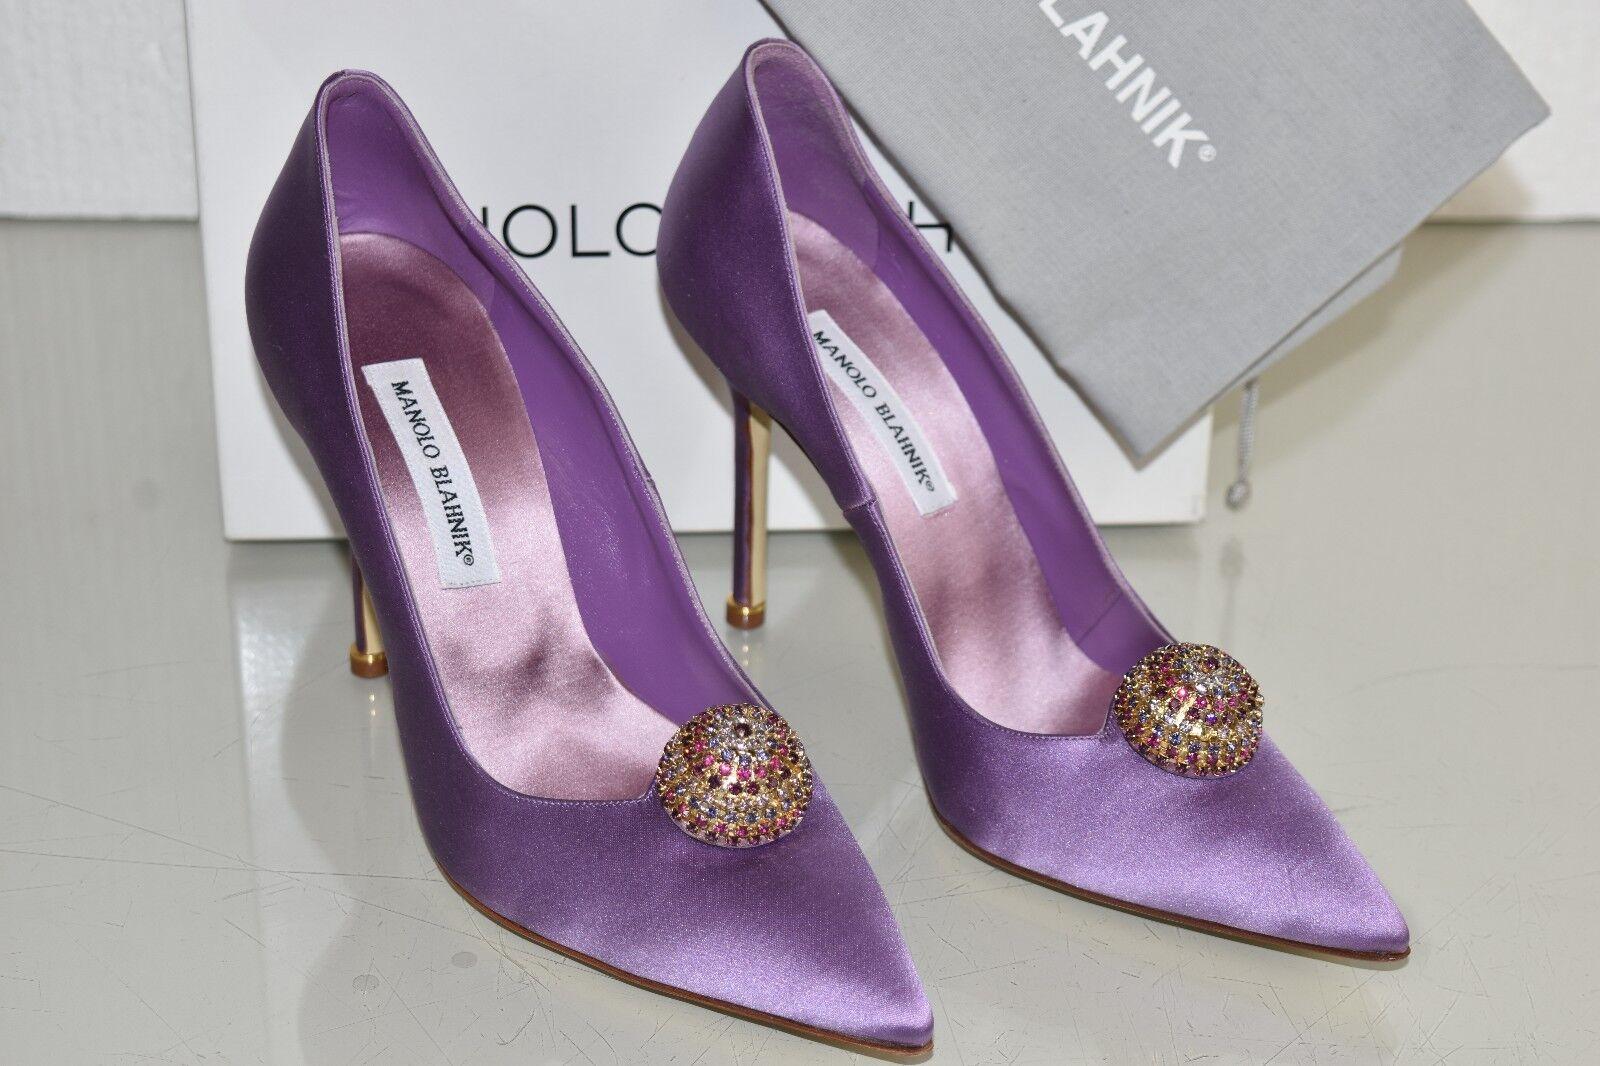 1245 NEW Manolo Blahnik BOTTANA  BB Satin purple Purple Jeweled Pumps shoes 41